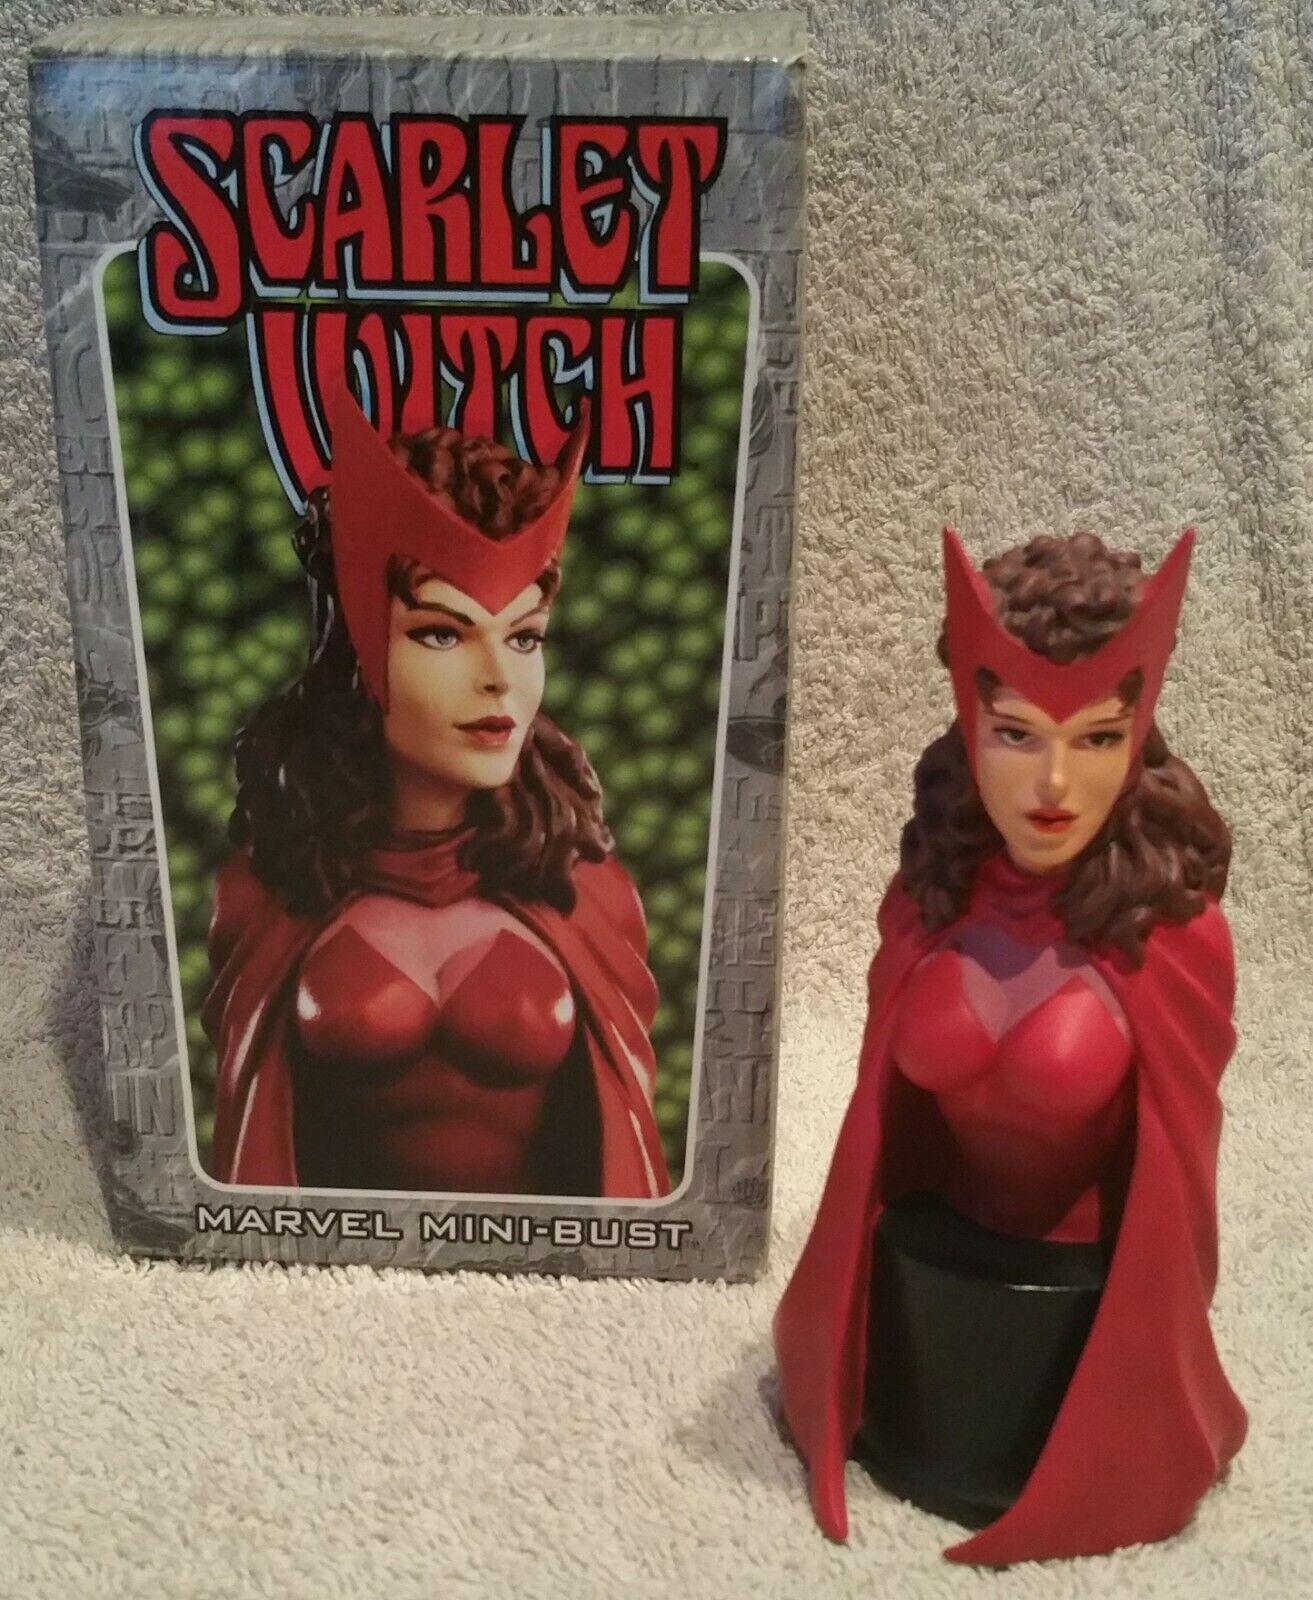 Busto LA BRUJA ESCocheLATA (SCochelet Witch - X-Men Vengadores) Bowen Designs 2000.